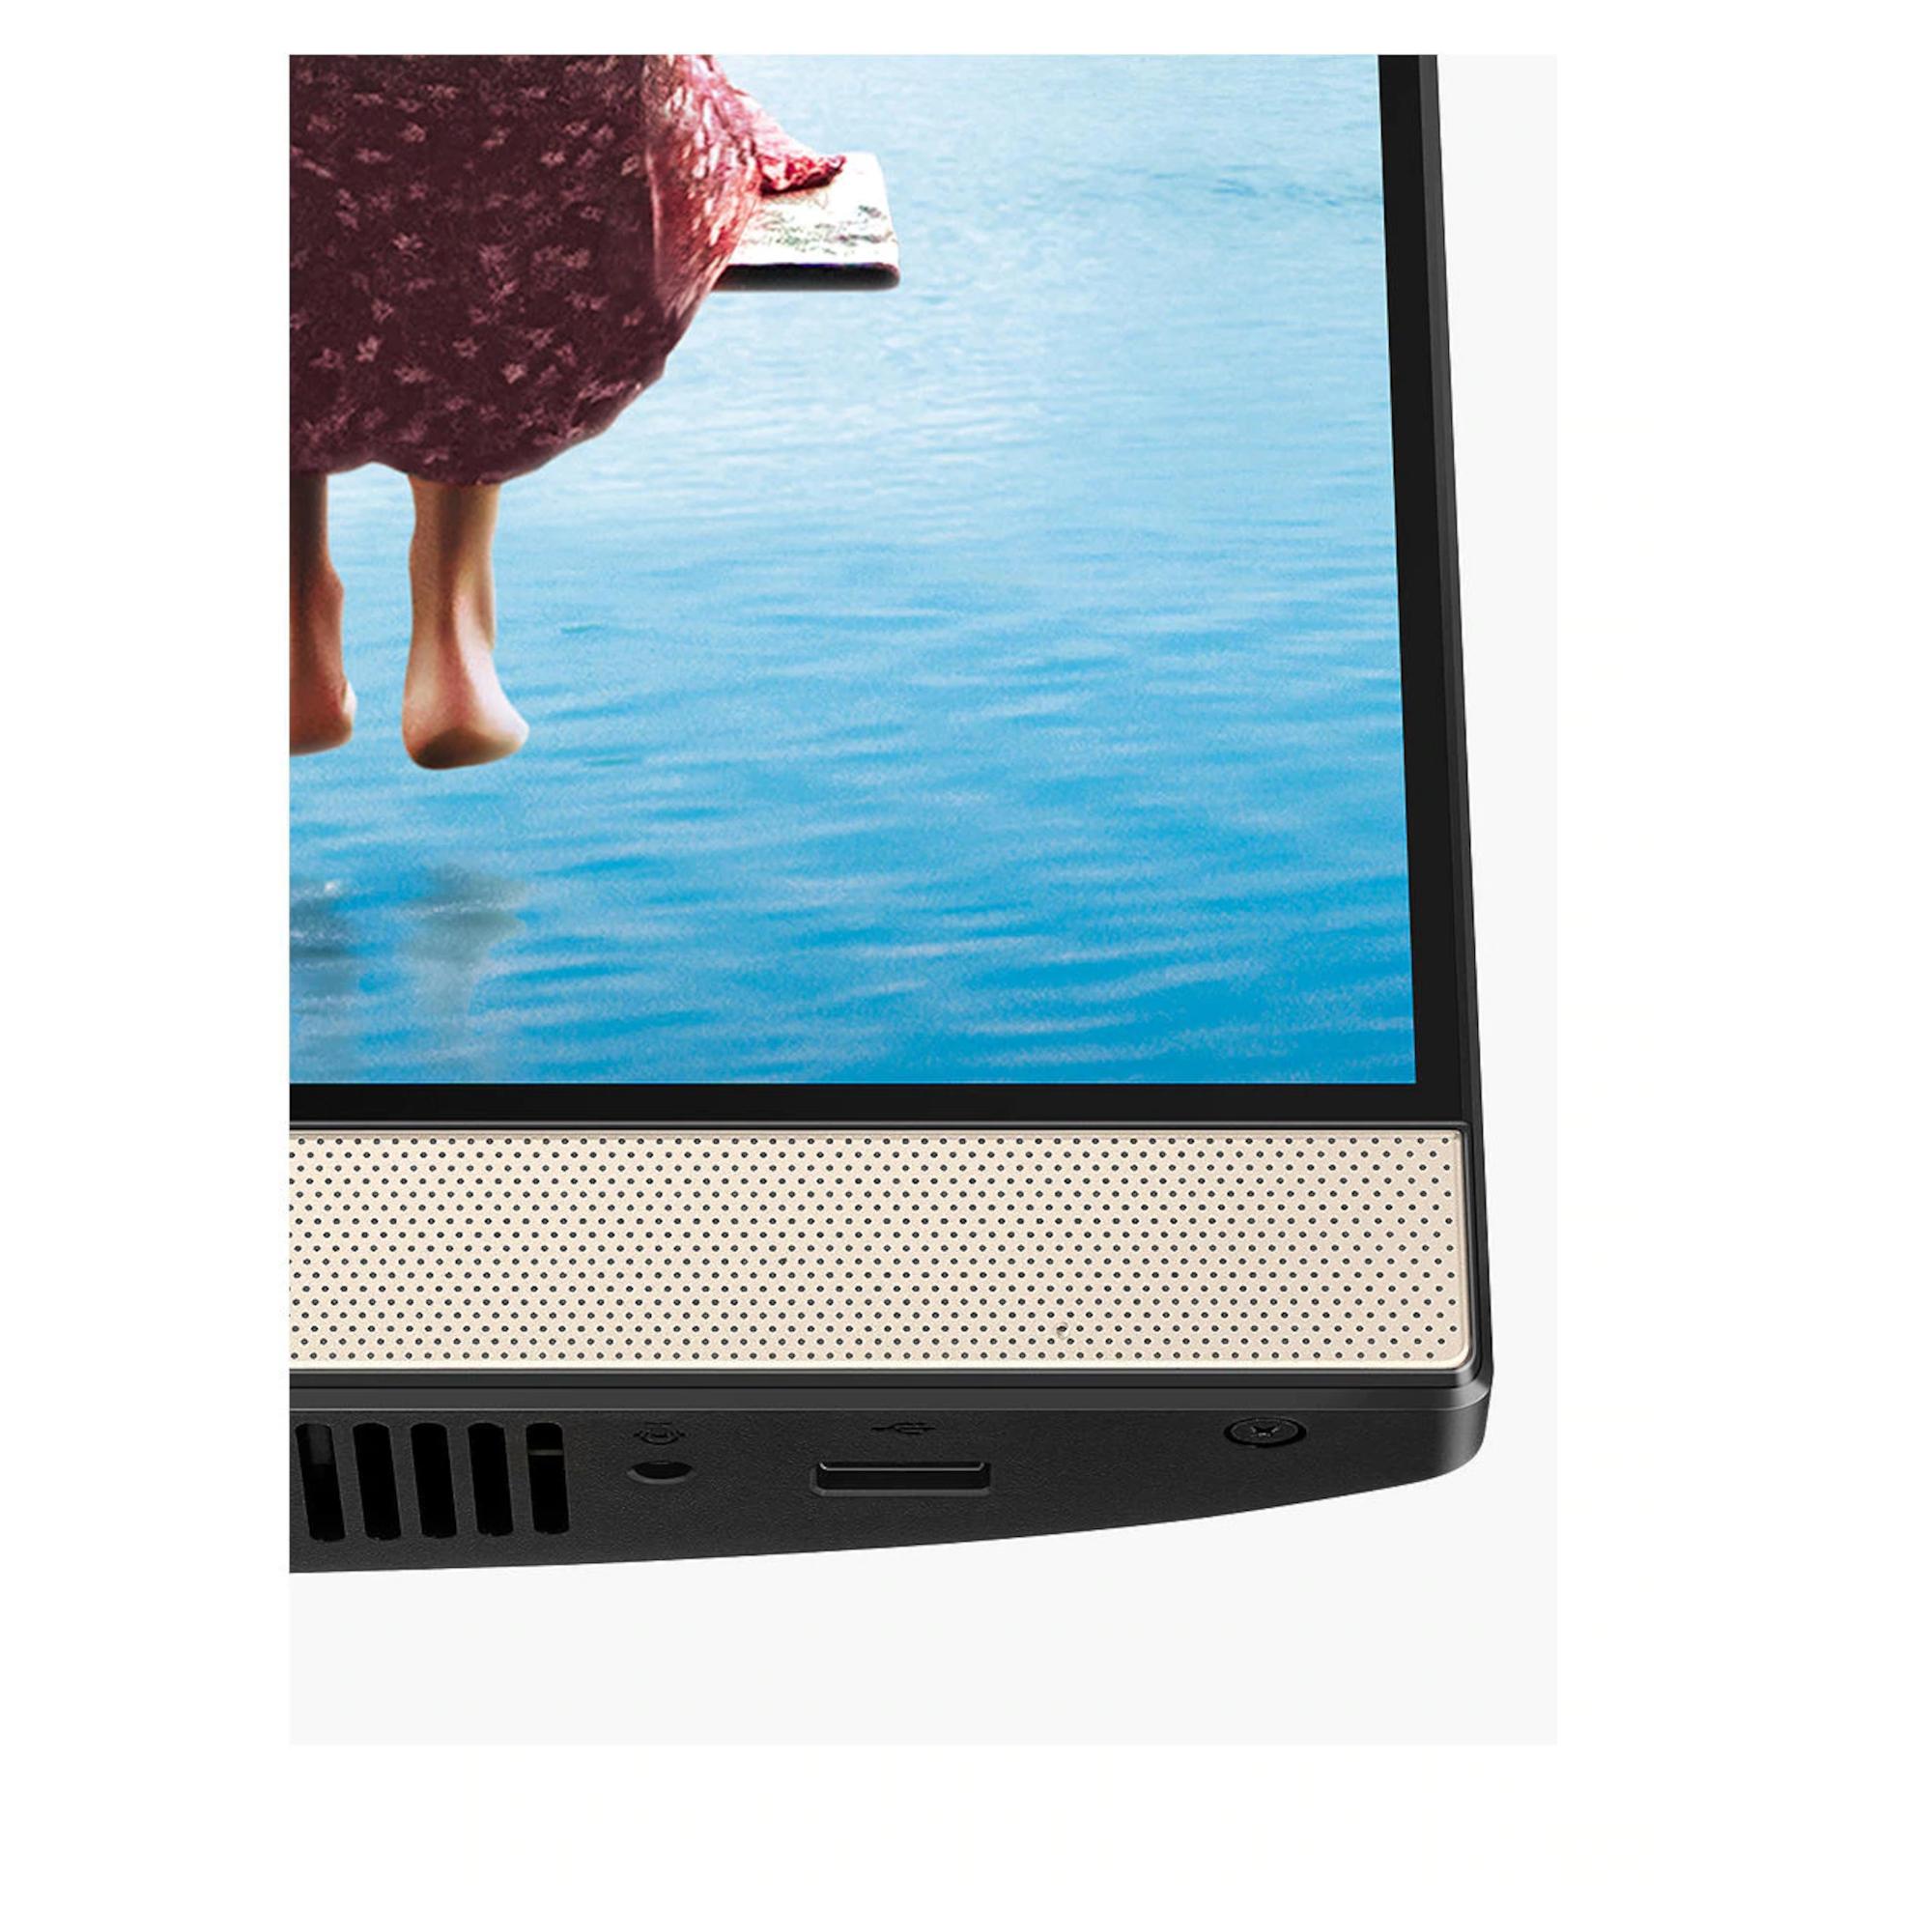 "ASUS V222FAK-BA113T 21.5"" Full HD All-In-One Desktop PC 8GB, 1TB HDD"